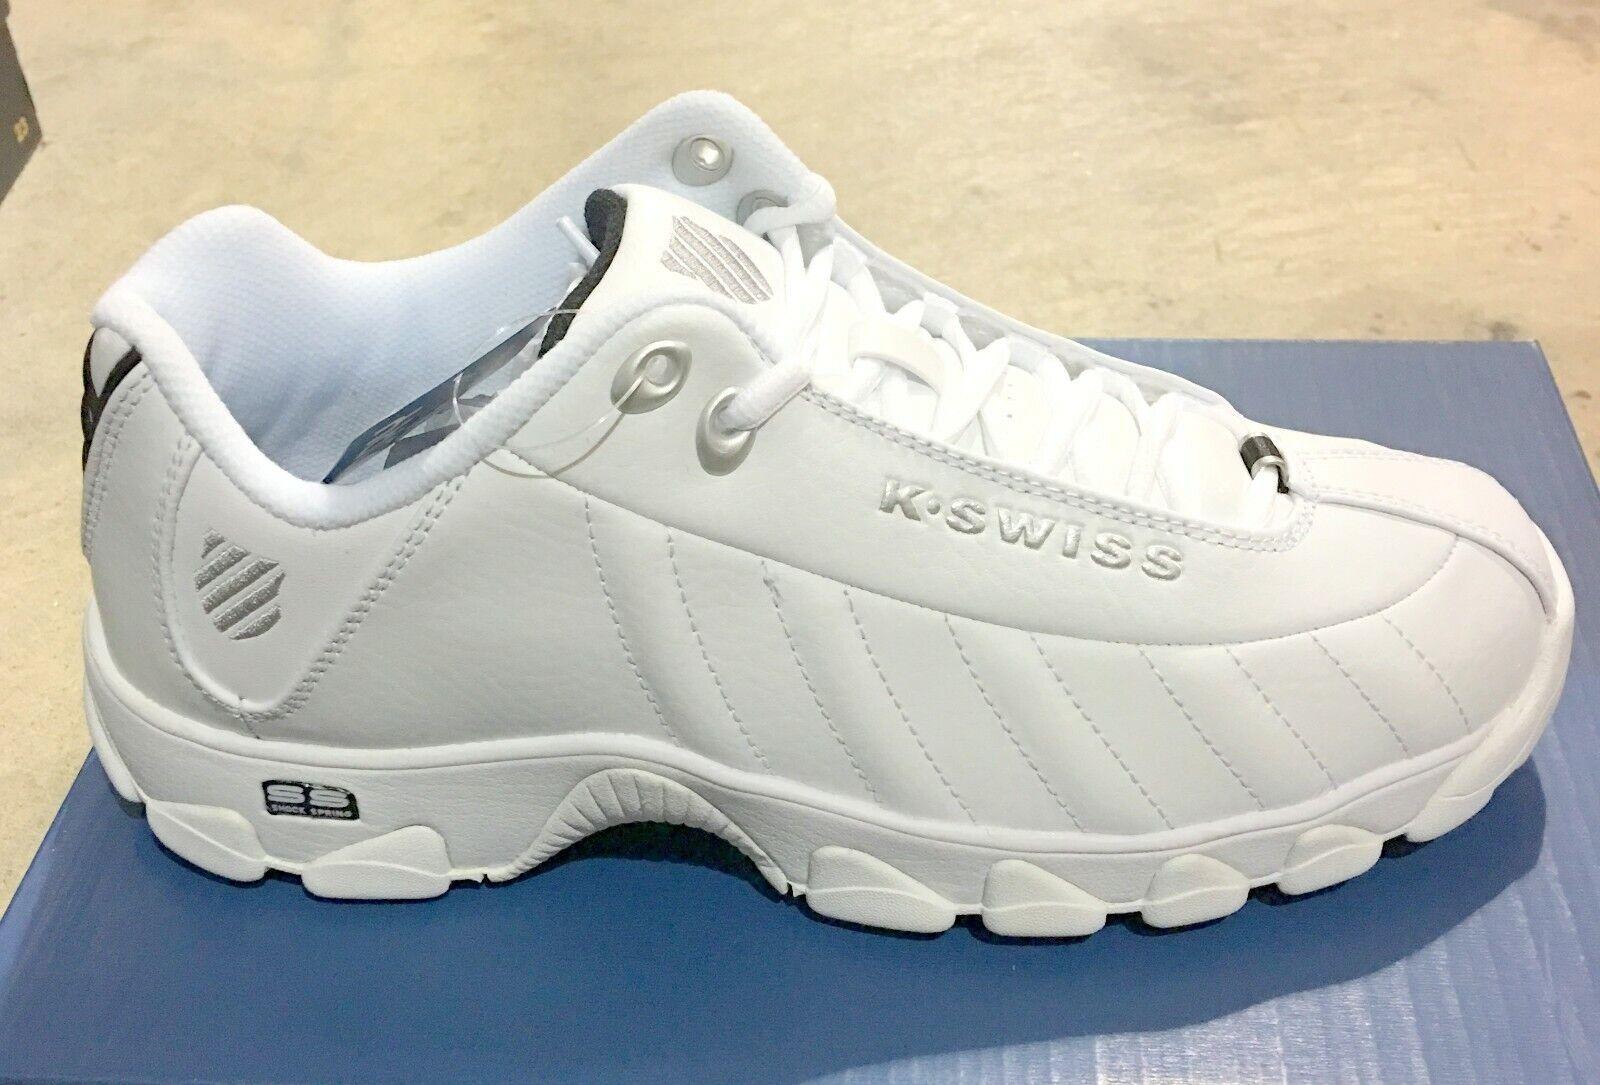 K-Swiss St329 Comfort Memory Foam-m K